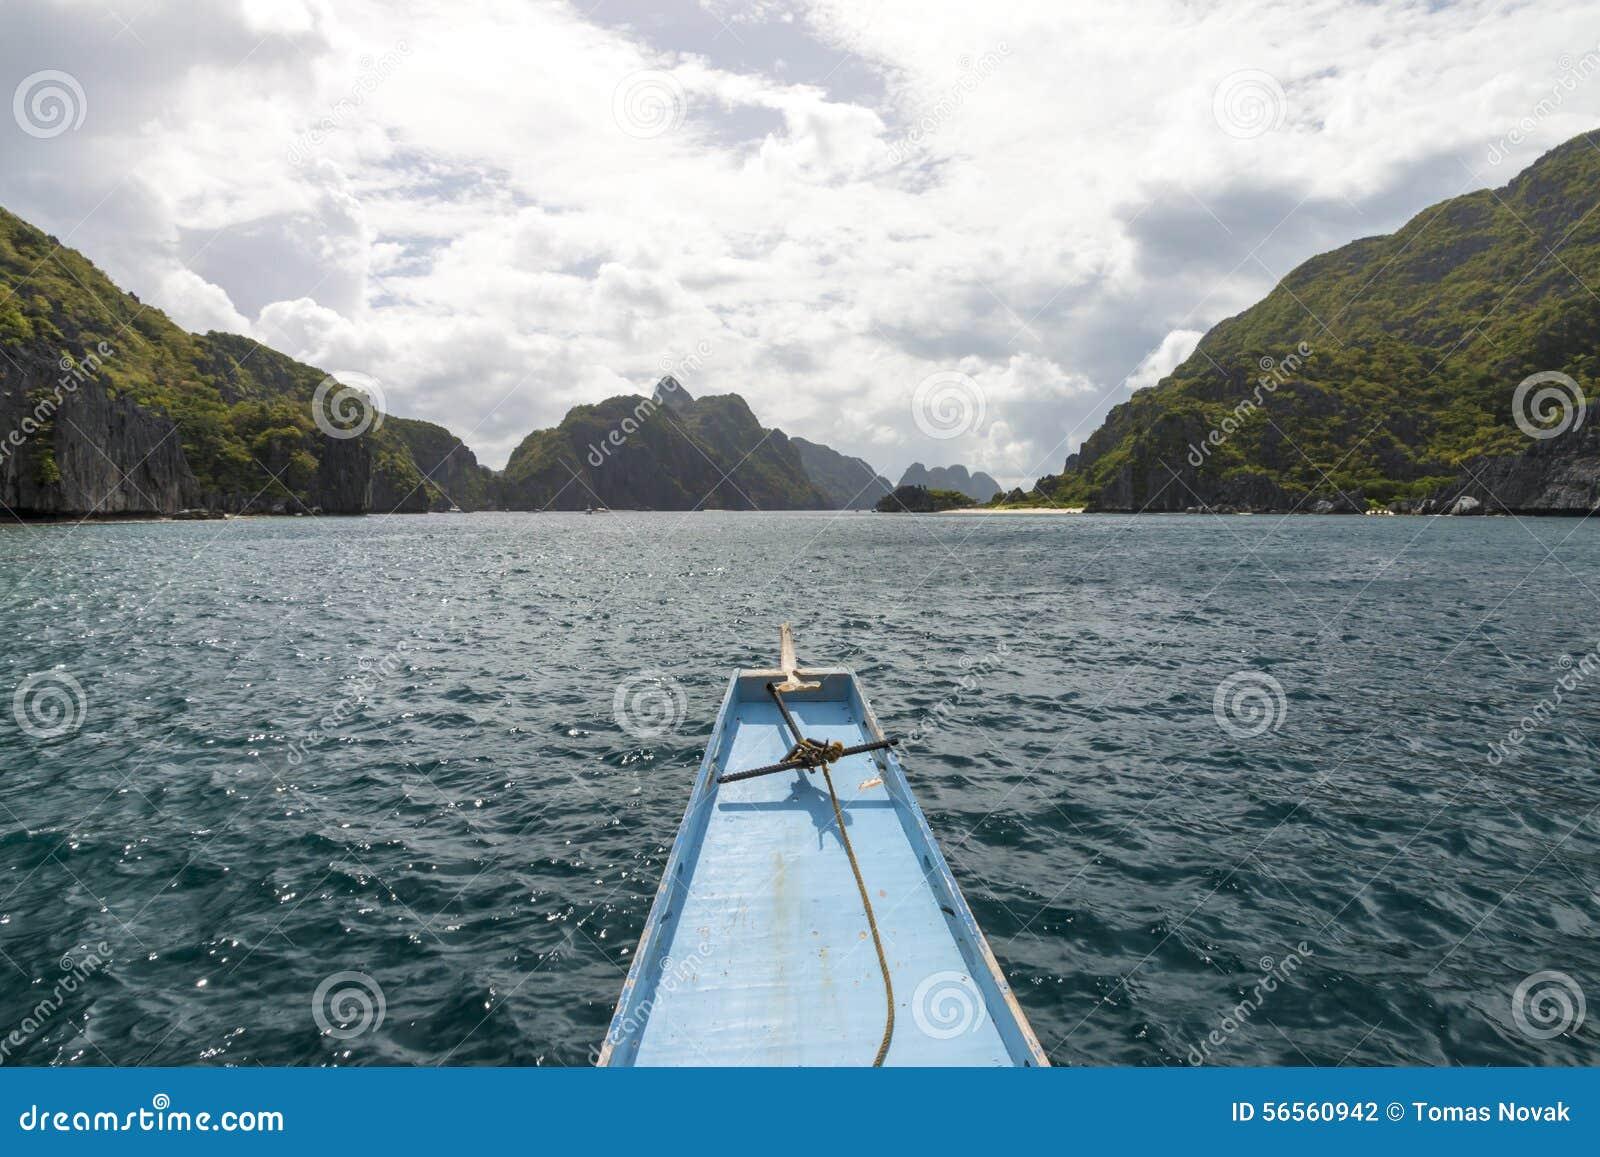 Download Βάρκα που πηγαίνει μεταξύ των πράσινων νησιών με τα δραματικά σύννεφα Στοκ Εικόνες - εικόνα από ειδυλλιακός, ωκεανός: 56560942